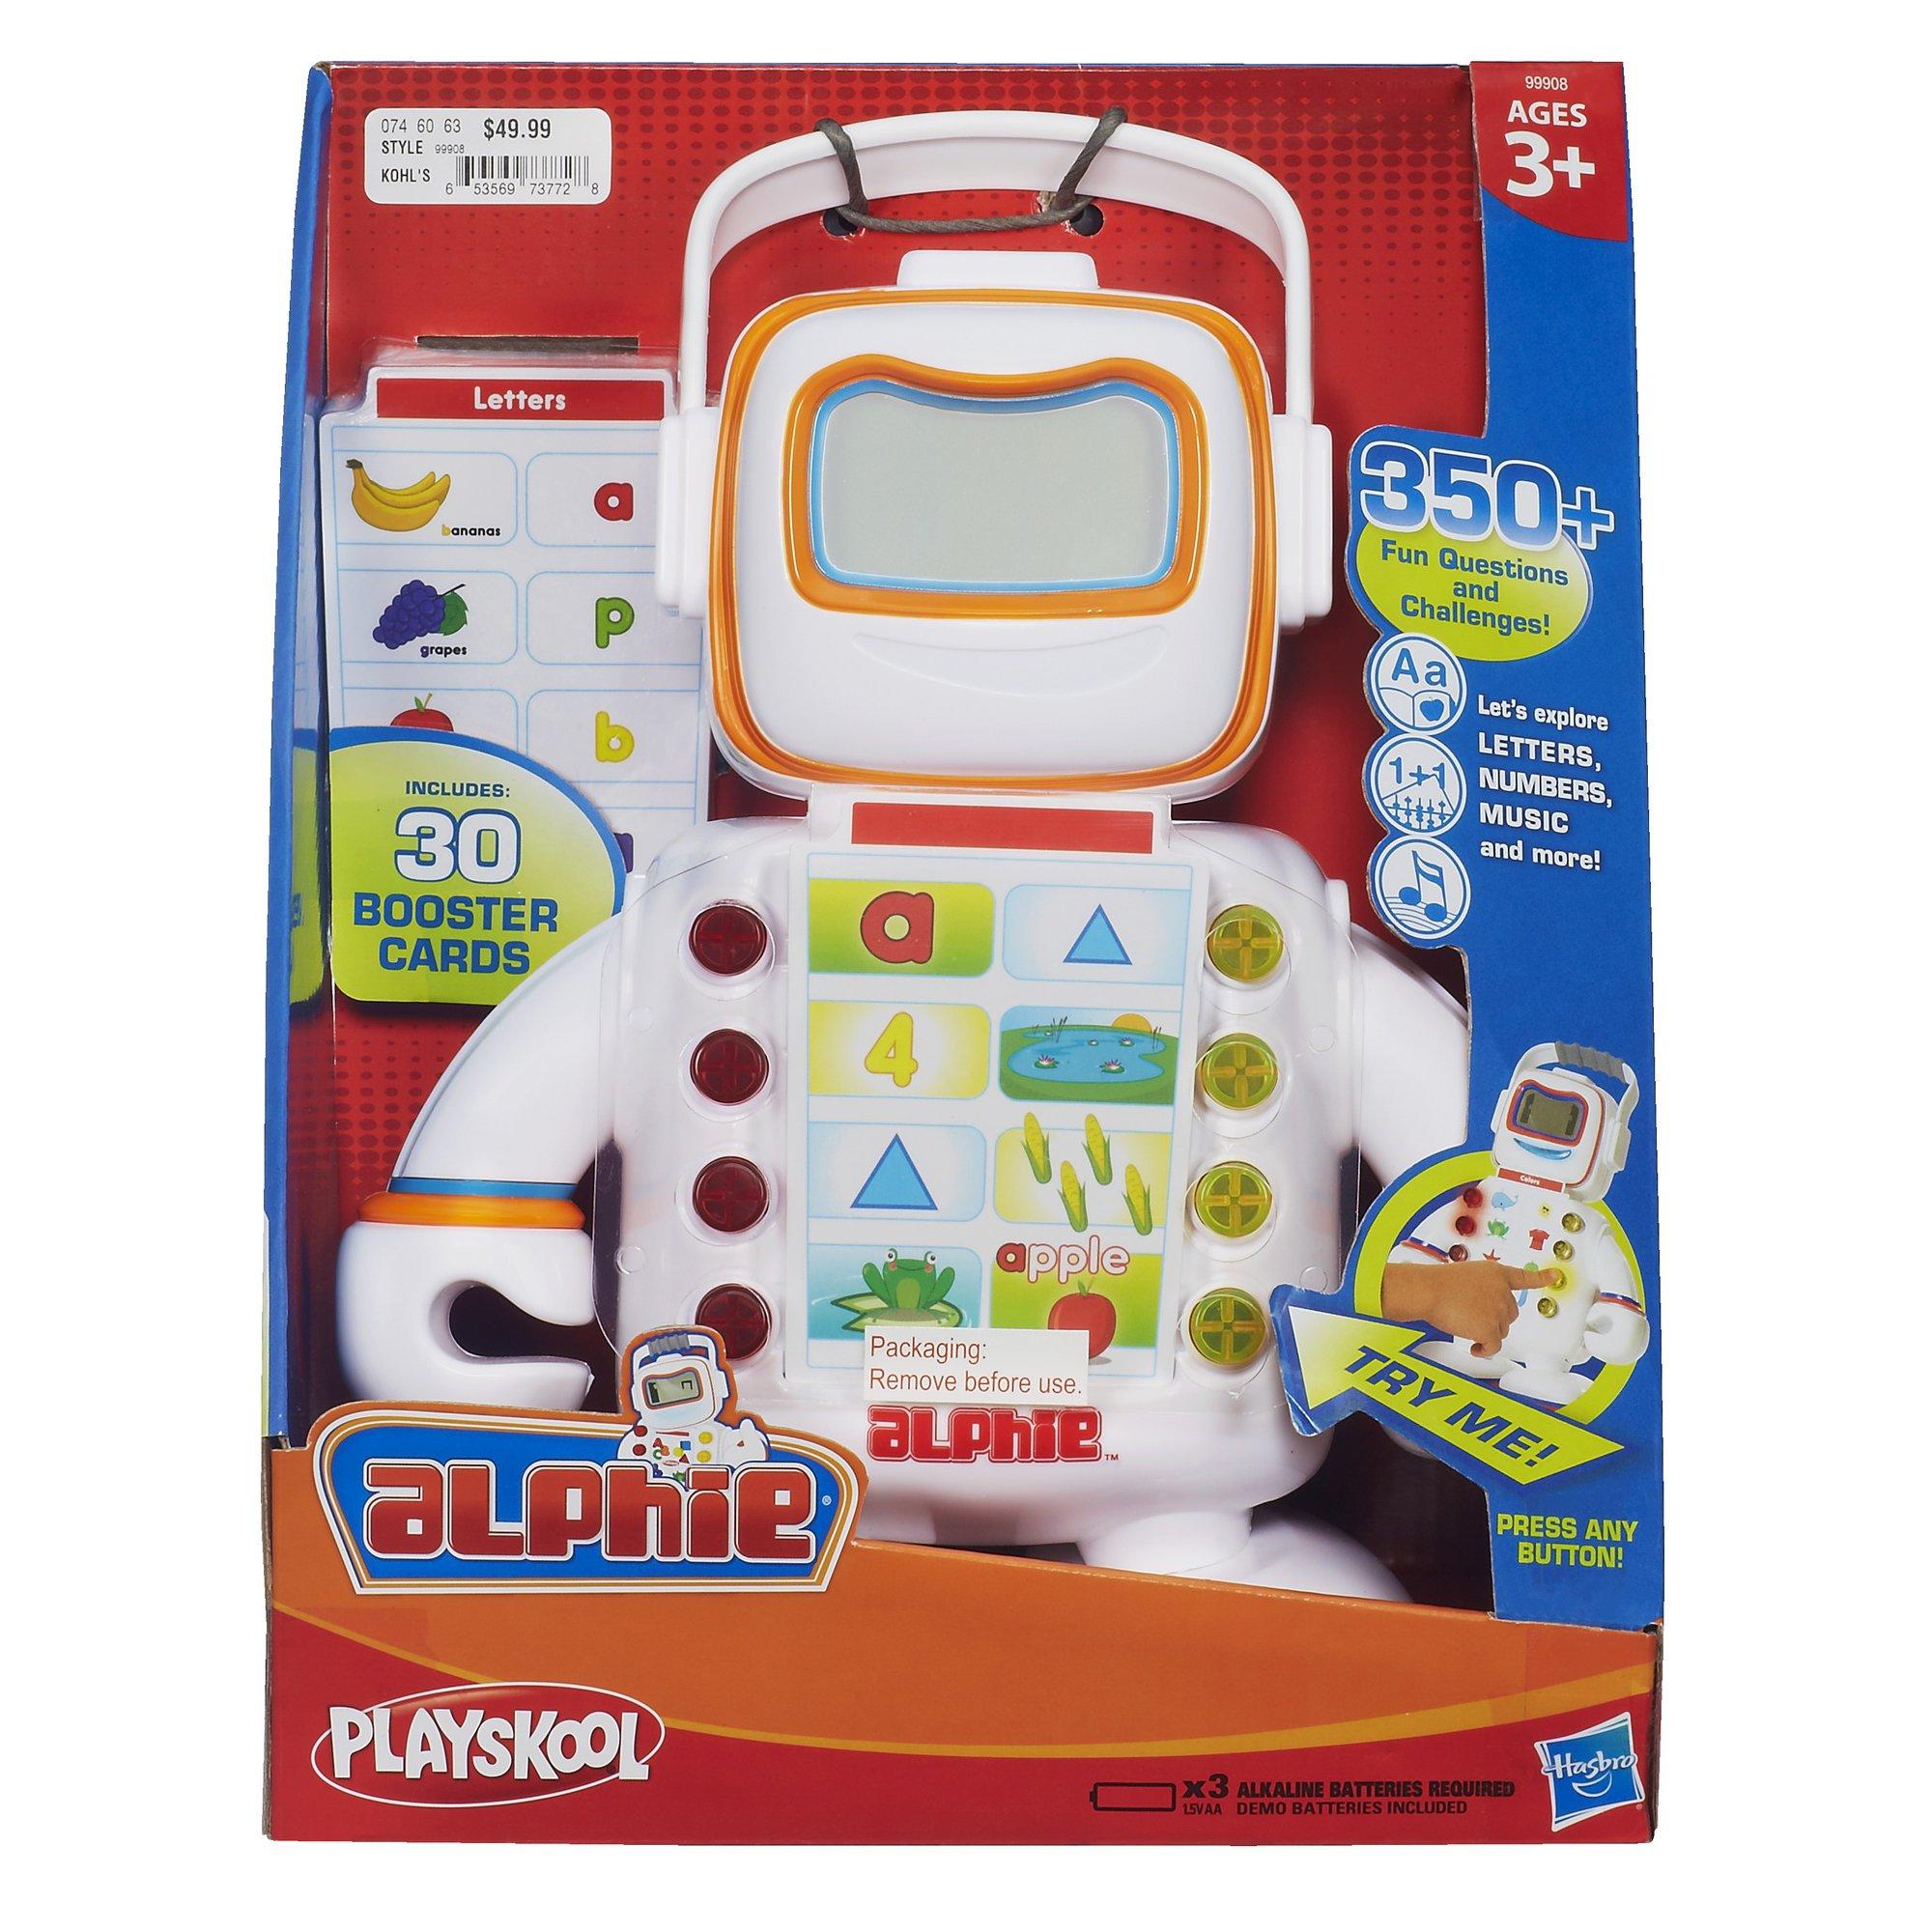 Playskool Alphie by Playskool (Image #3)